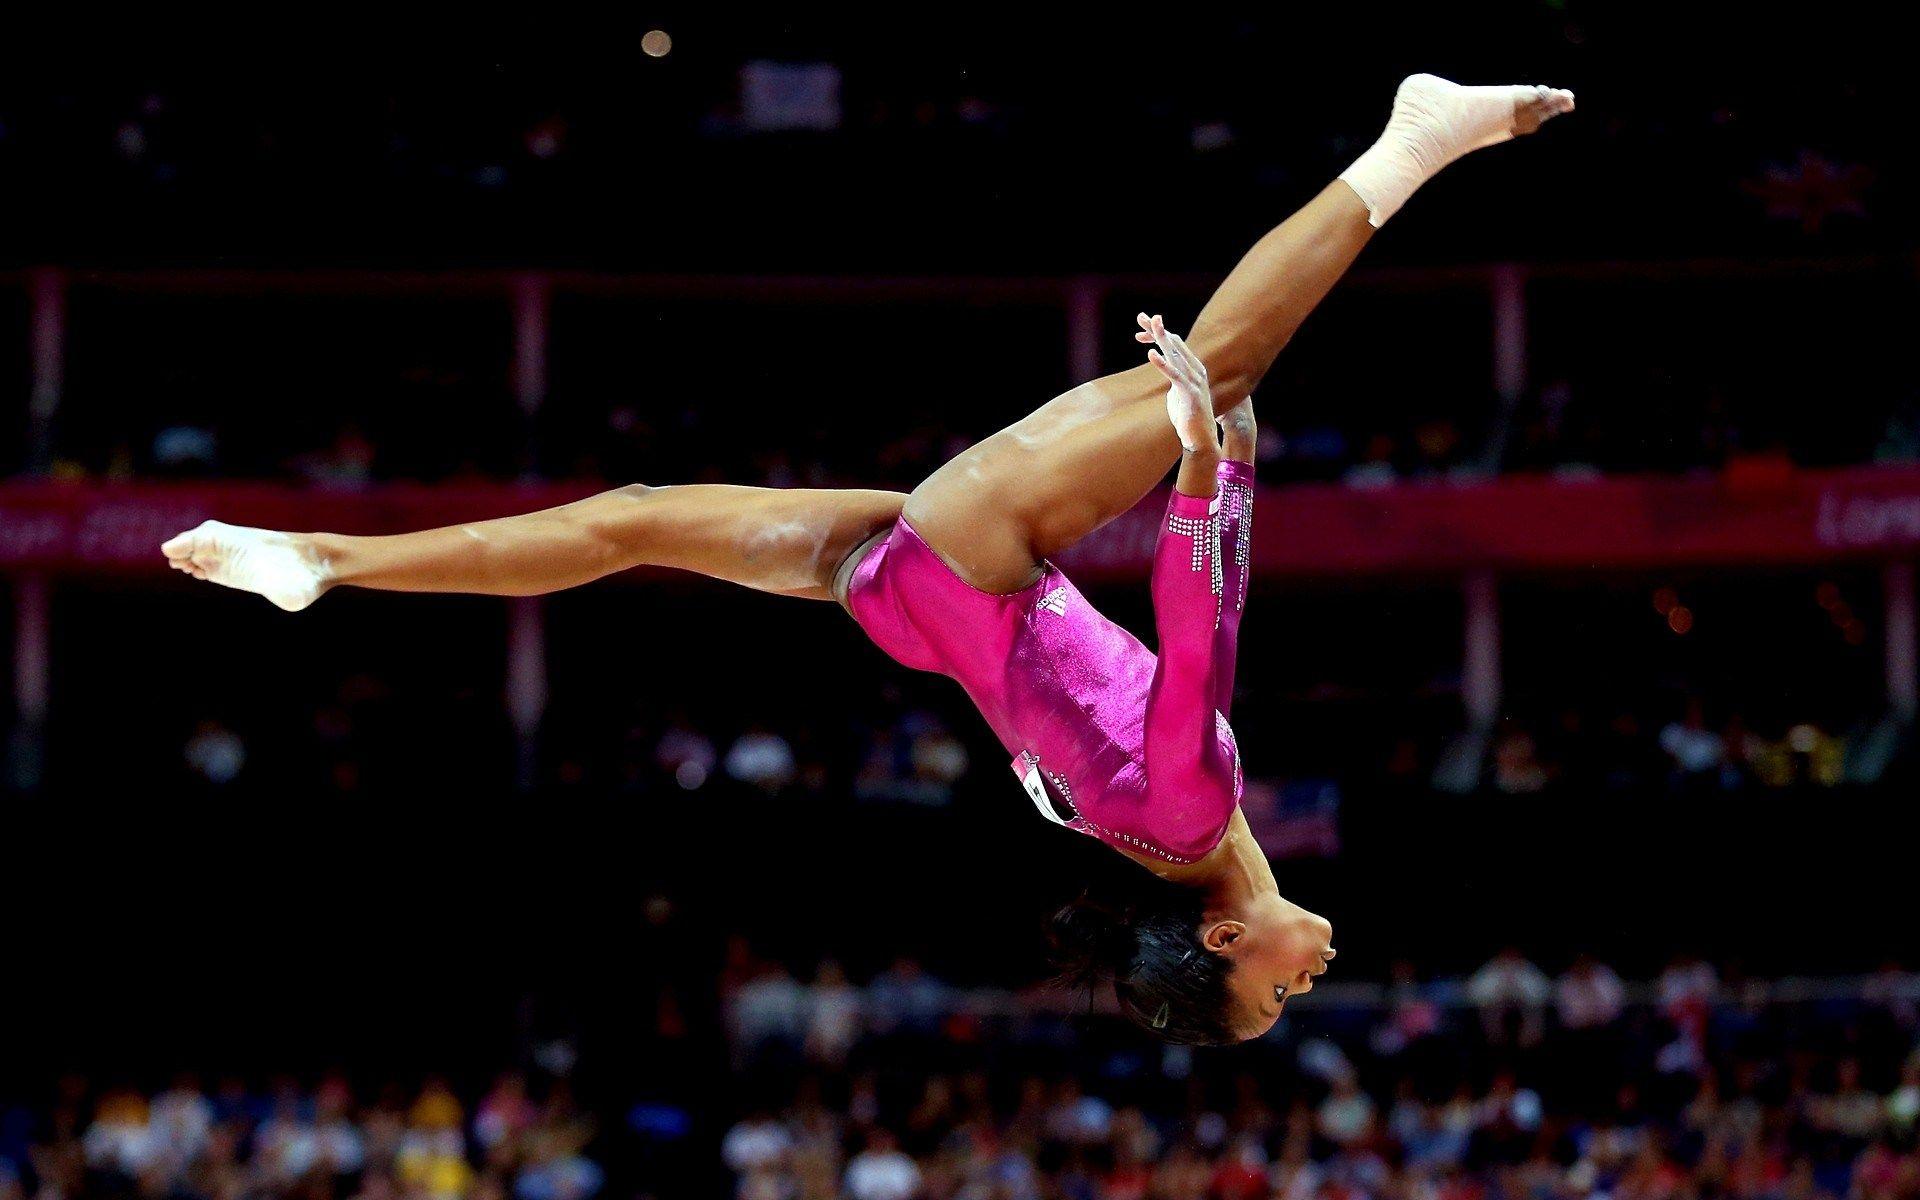 gymnastics pictures hd Gymnastics backgrounds